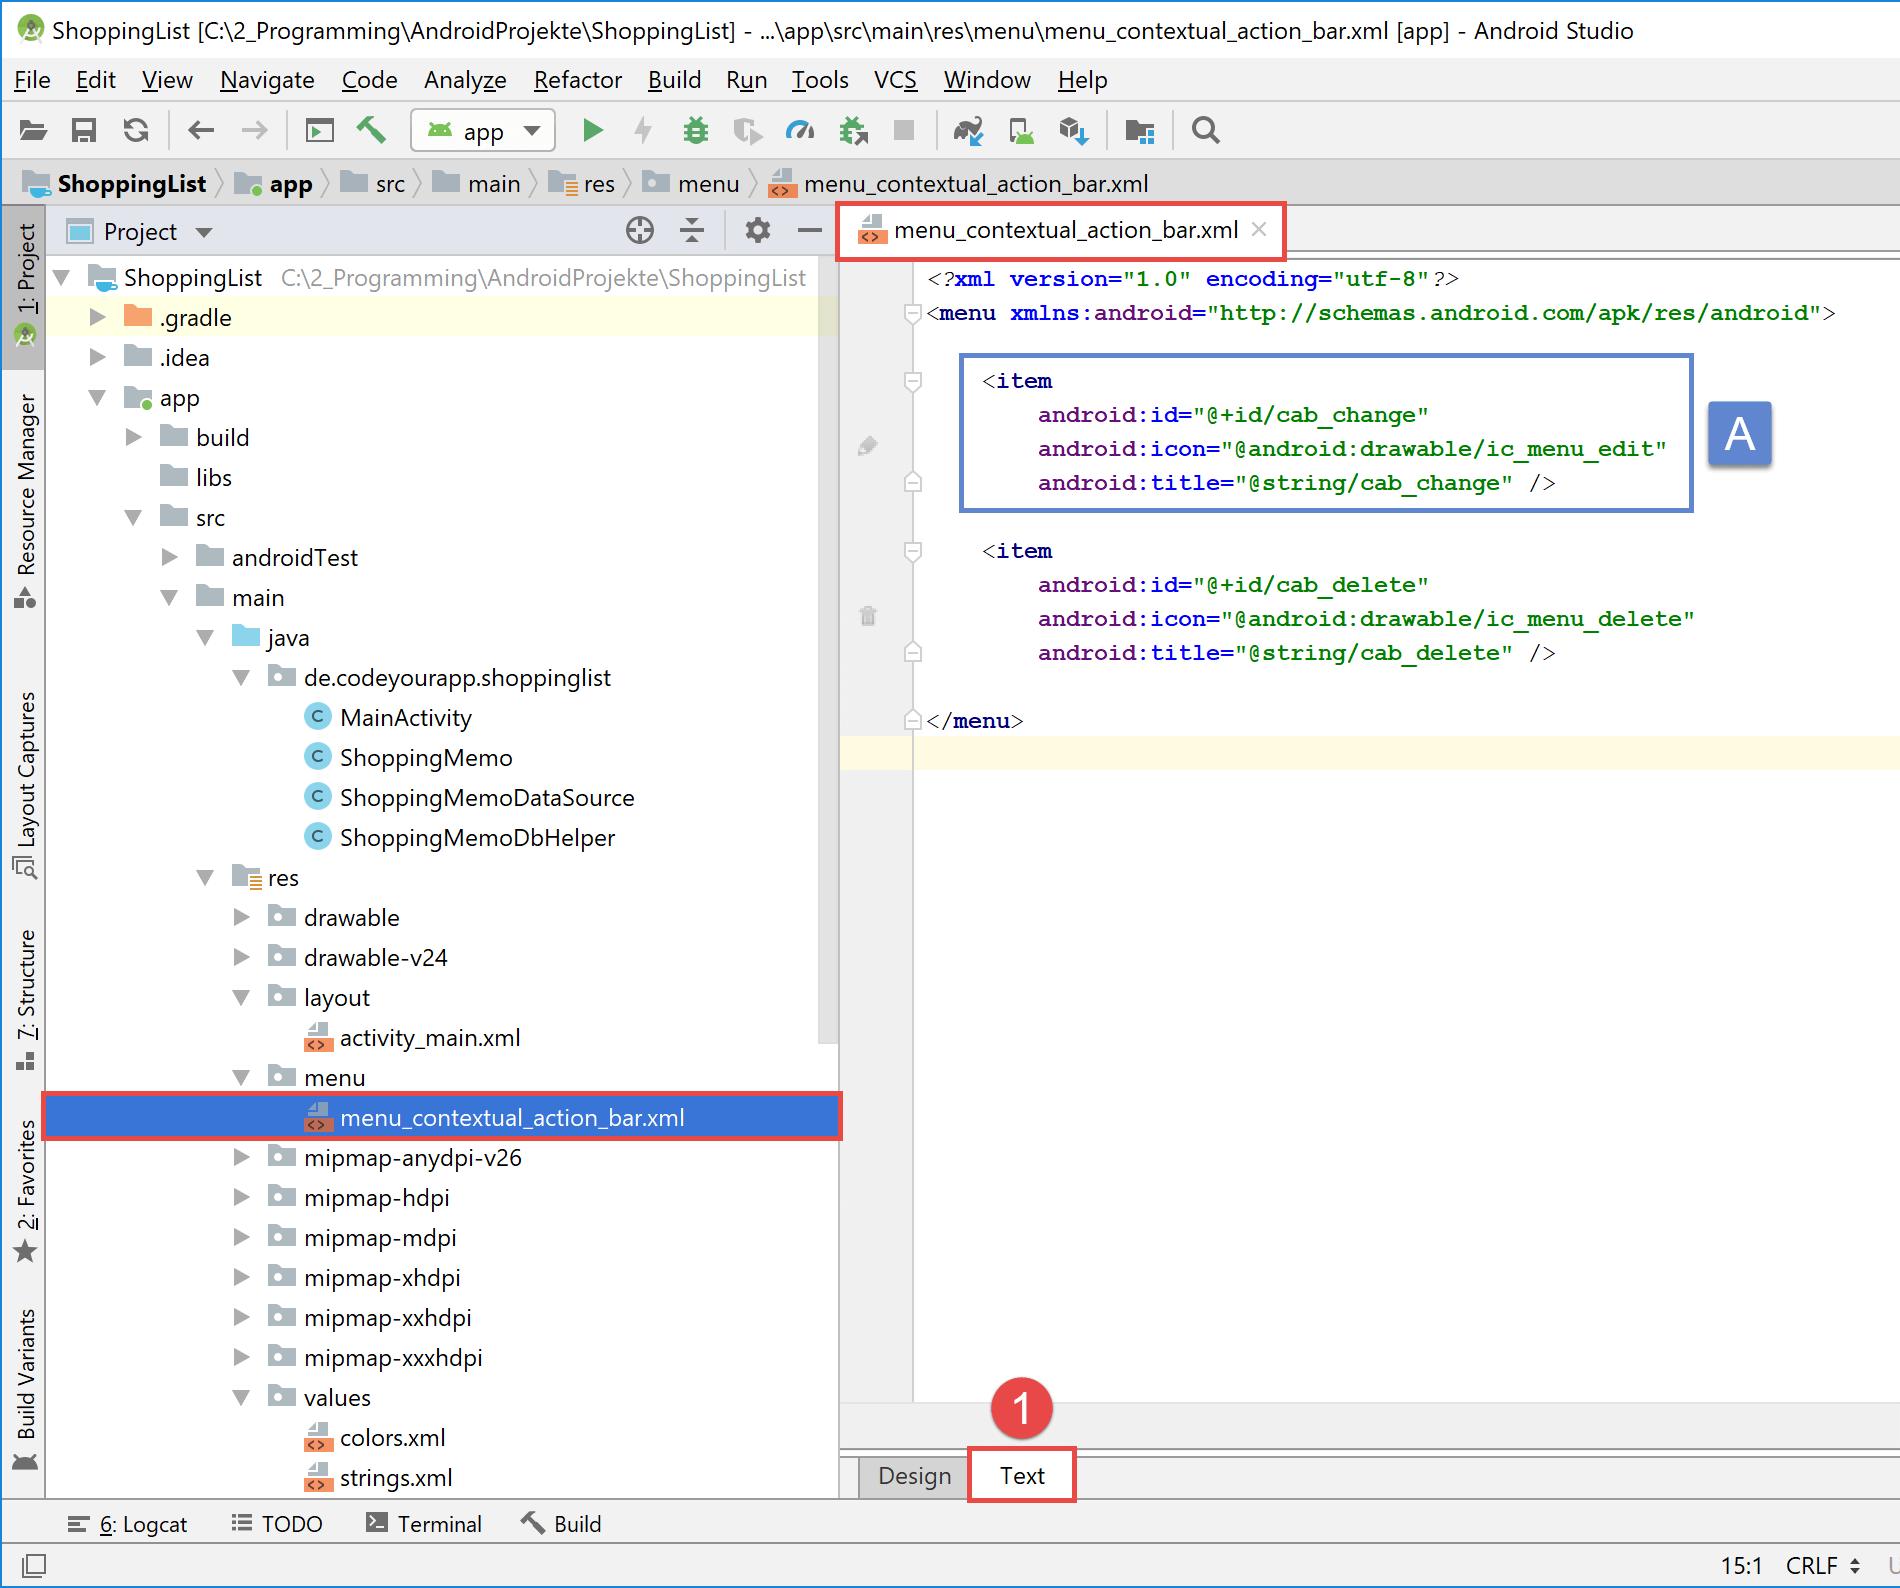 android_sqlite_update_cab